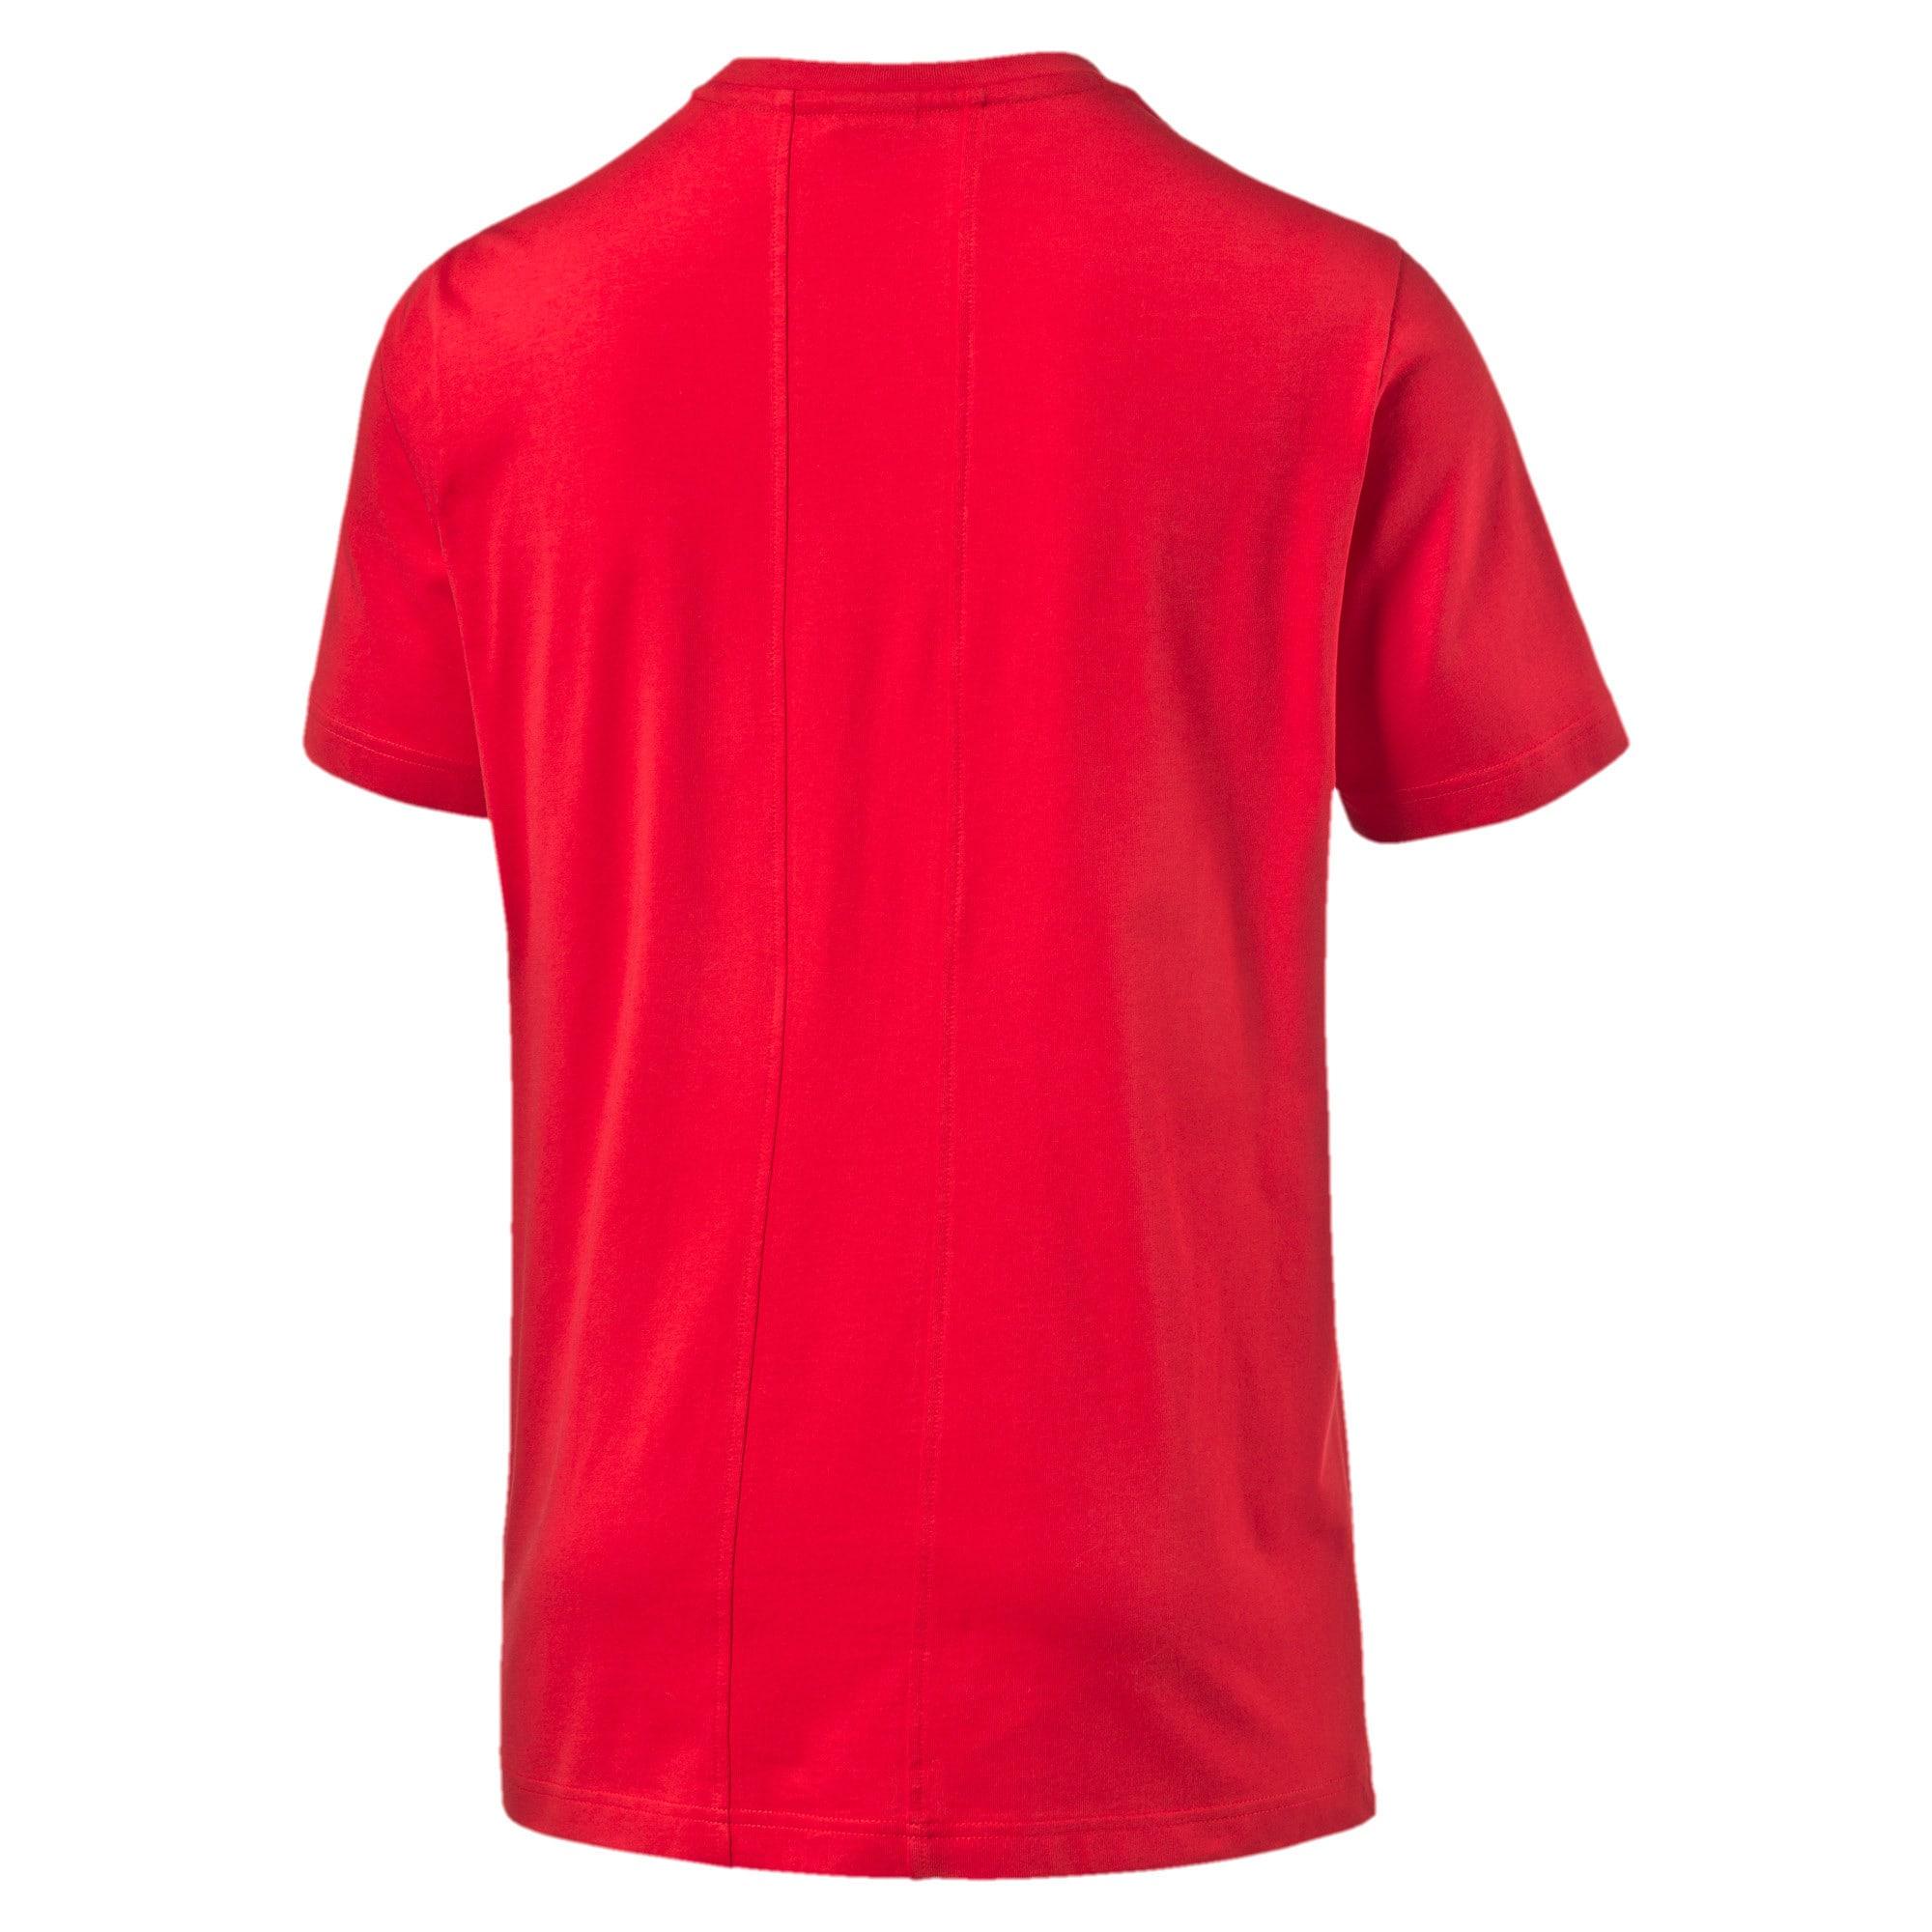 Thumbnail 5 of Ferrari Graphic T-Shirt, rosso corsa, medium-IND